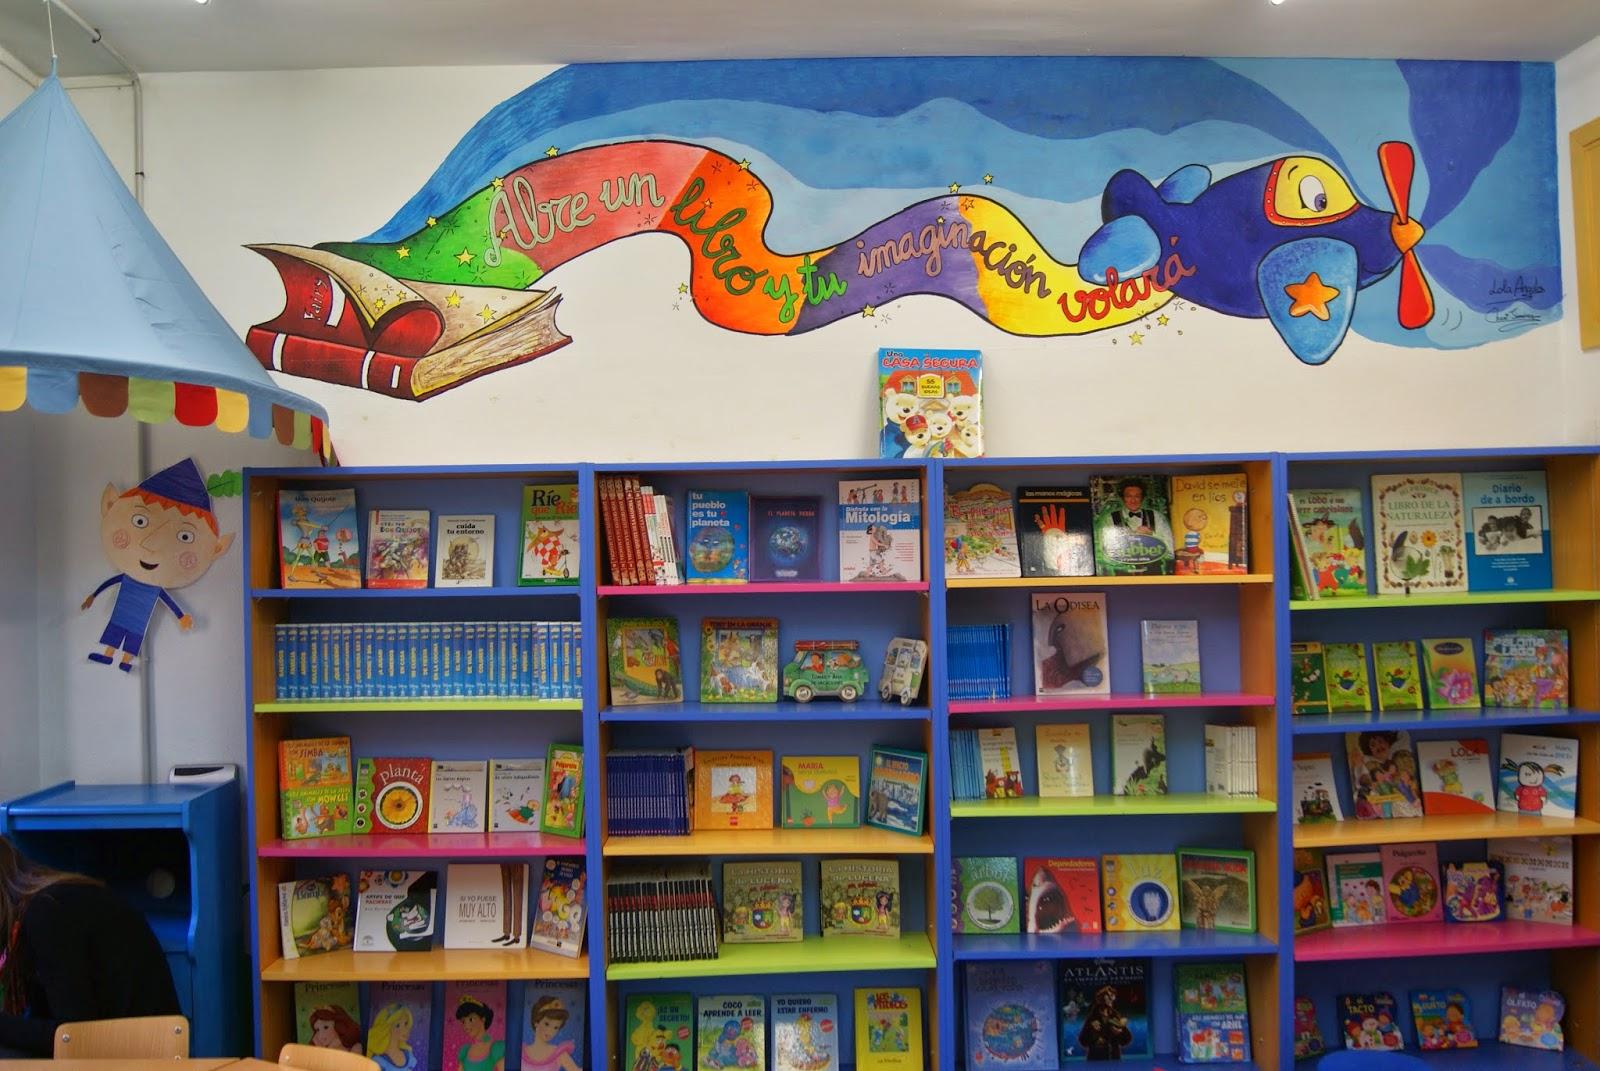 El rinc n de la educaci n f sica la biblioteca de mi cole - Estanteria biblioteca infantil ...